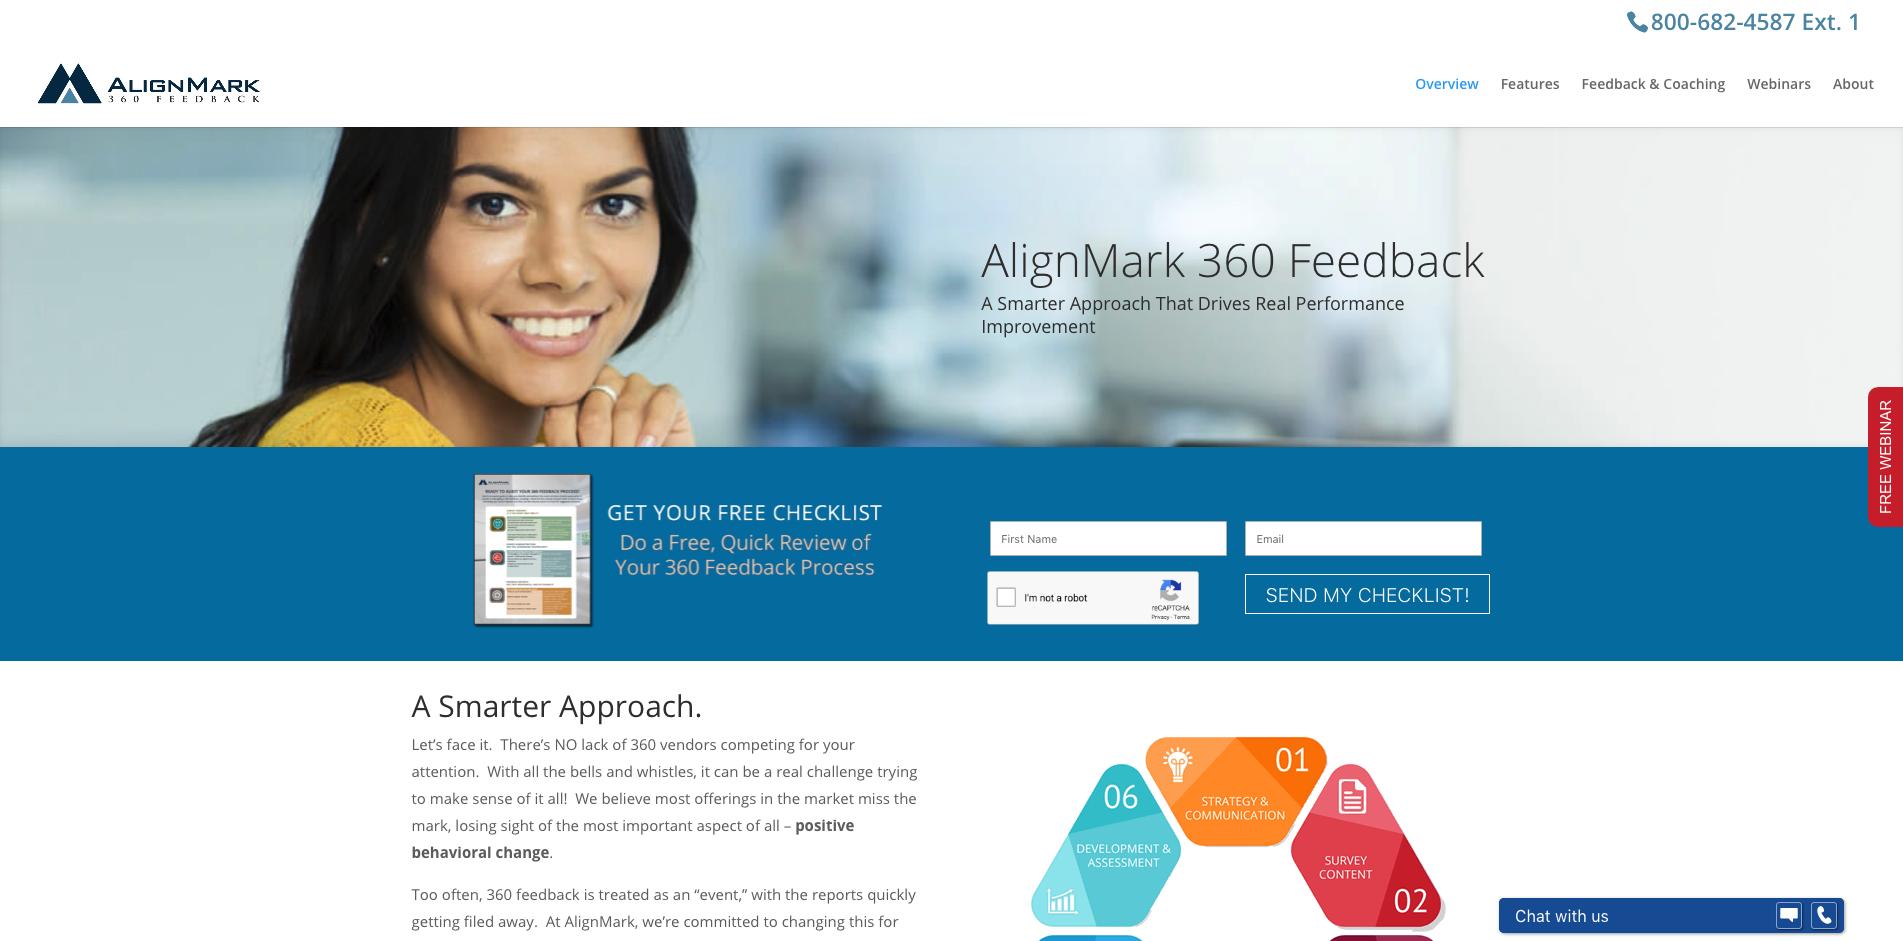 AlignMark 360 Feedback